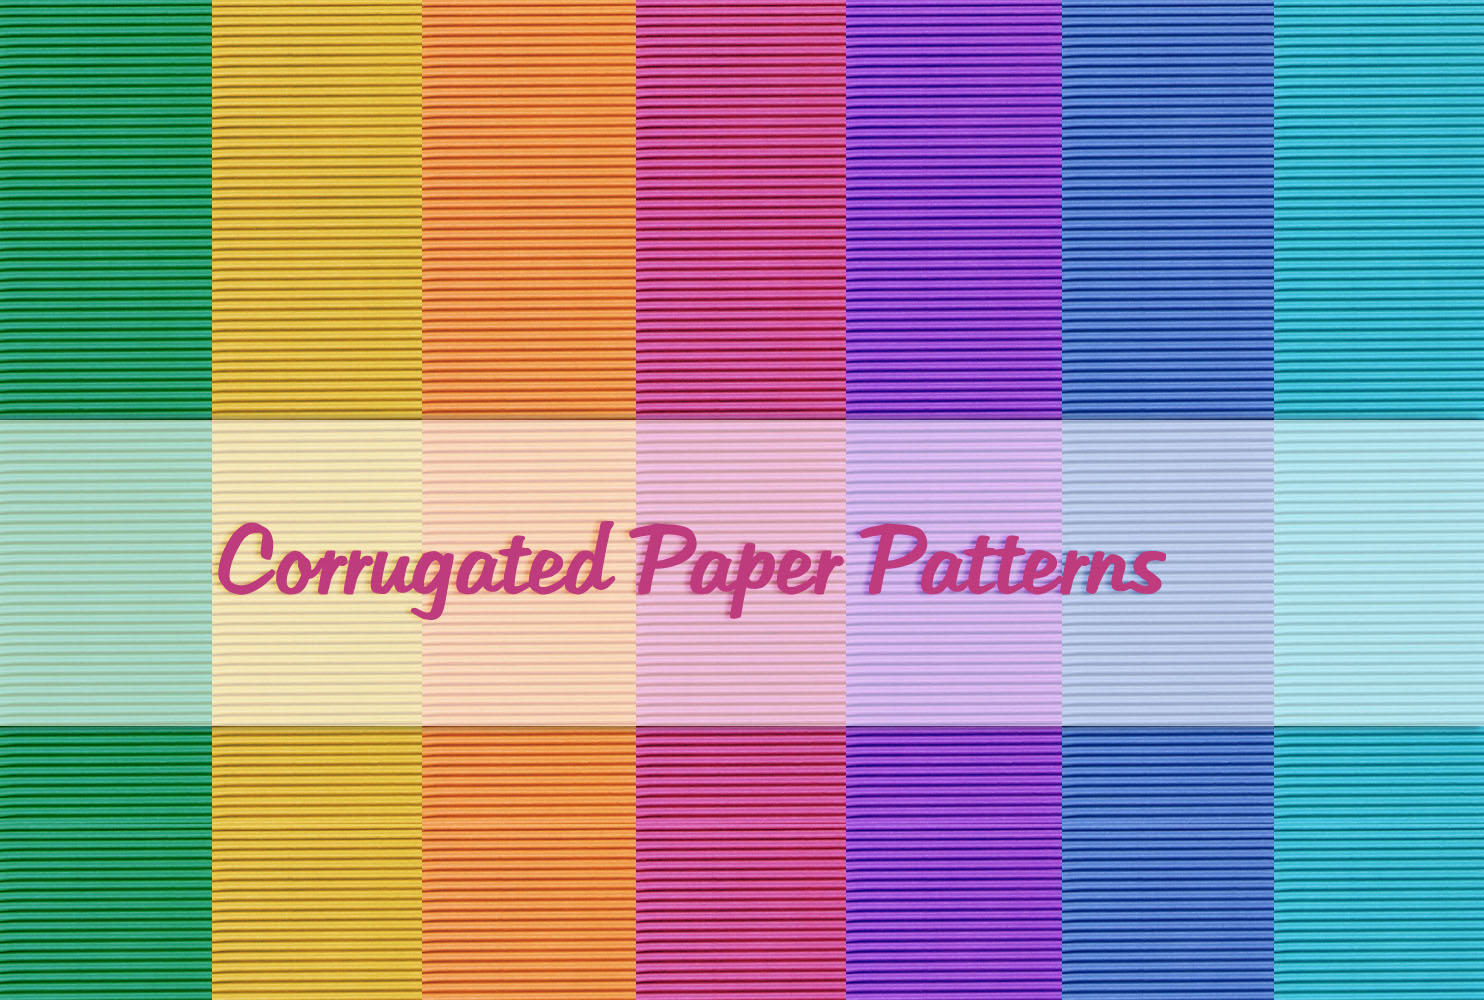 Corrugated Paper Patterns by powerpuffjazz